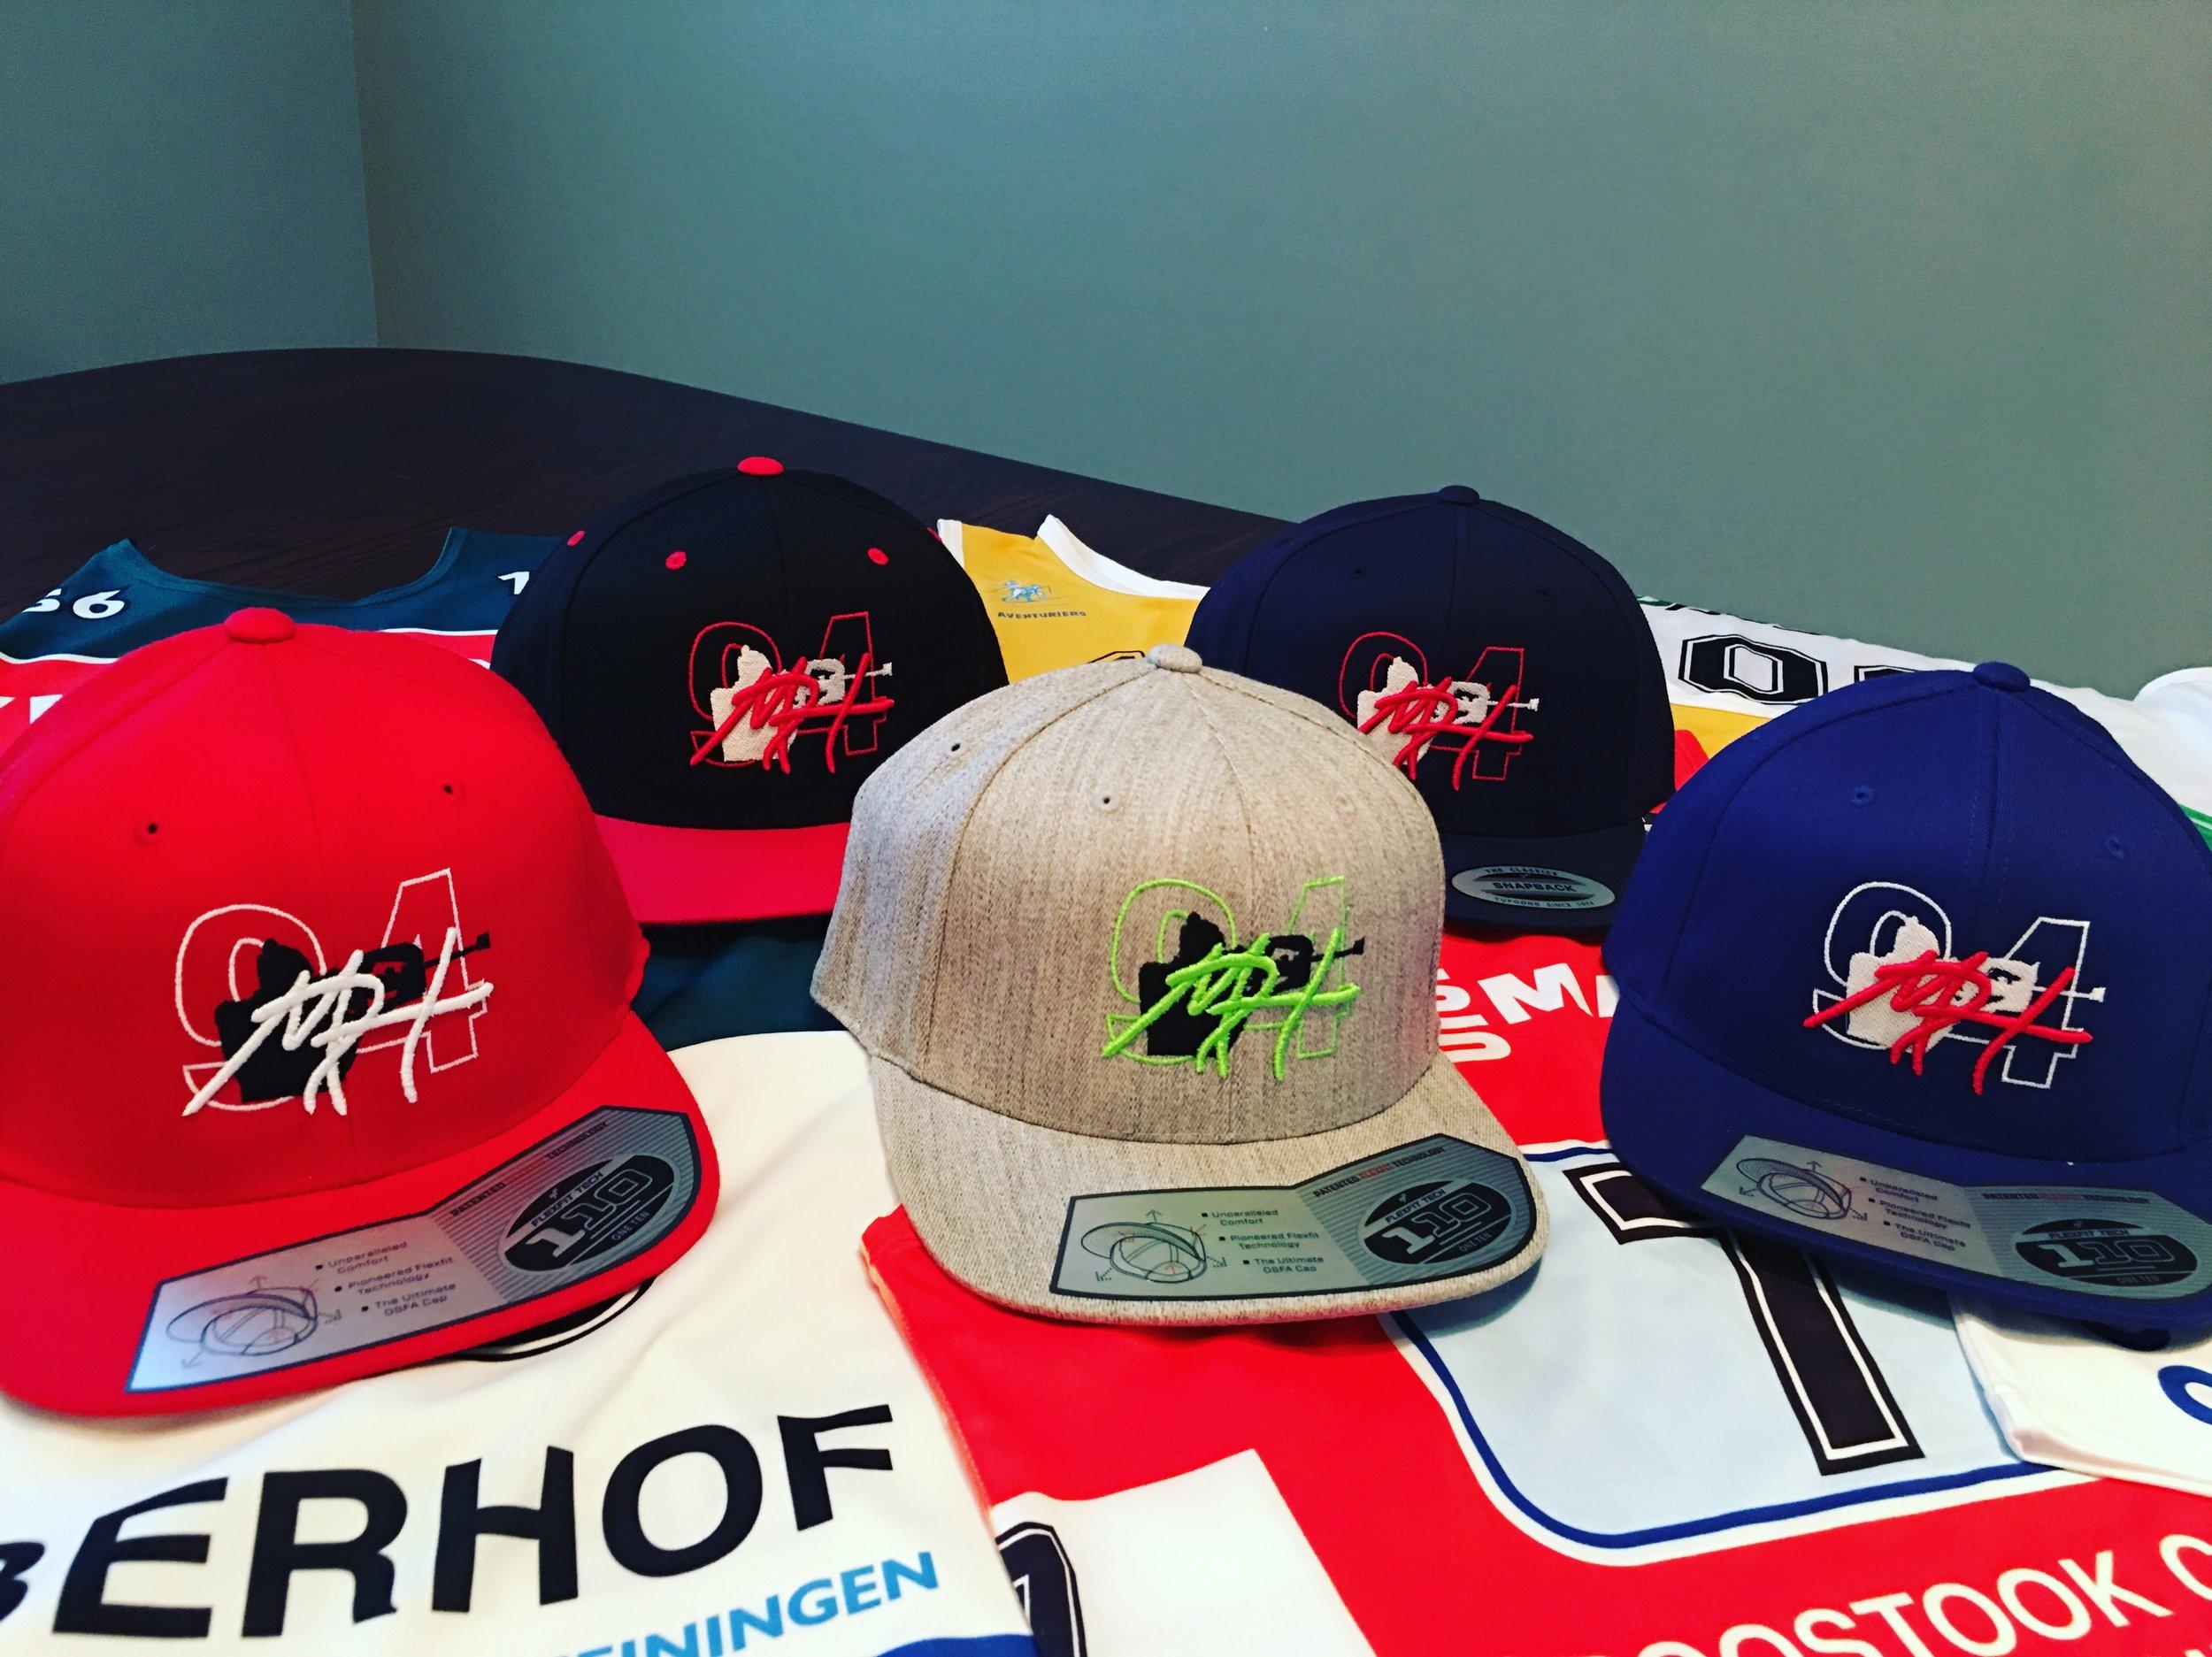 Matt Hudec designed hats